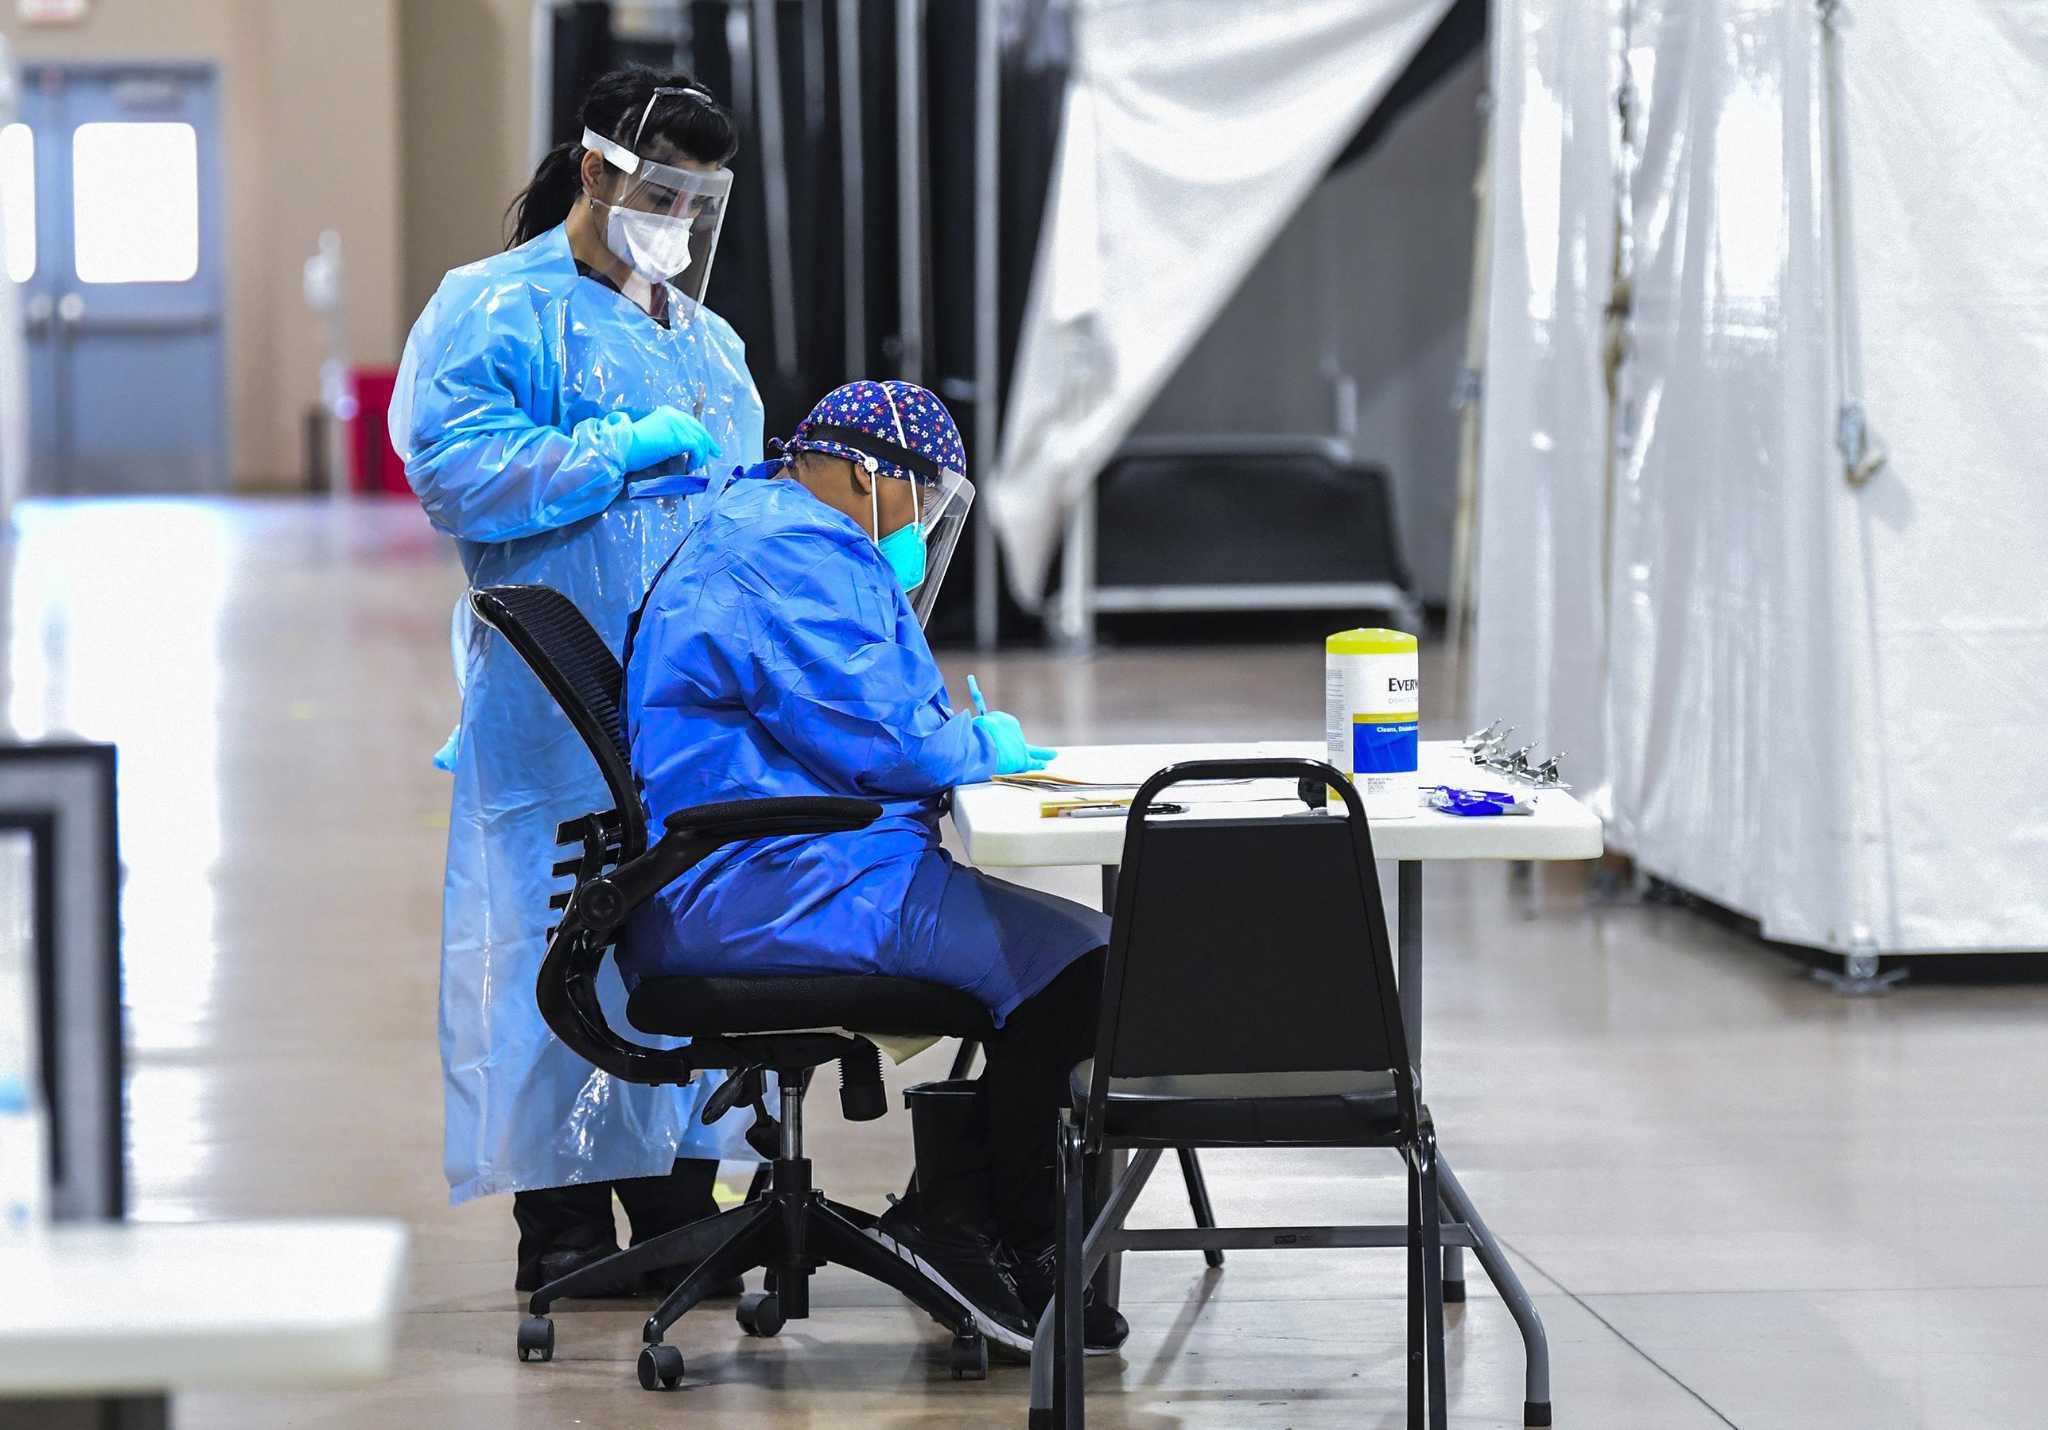 San Antonio reaches another tragic milestone as COVID-19 deaths surge above 2,000